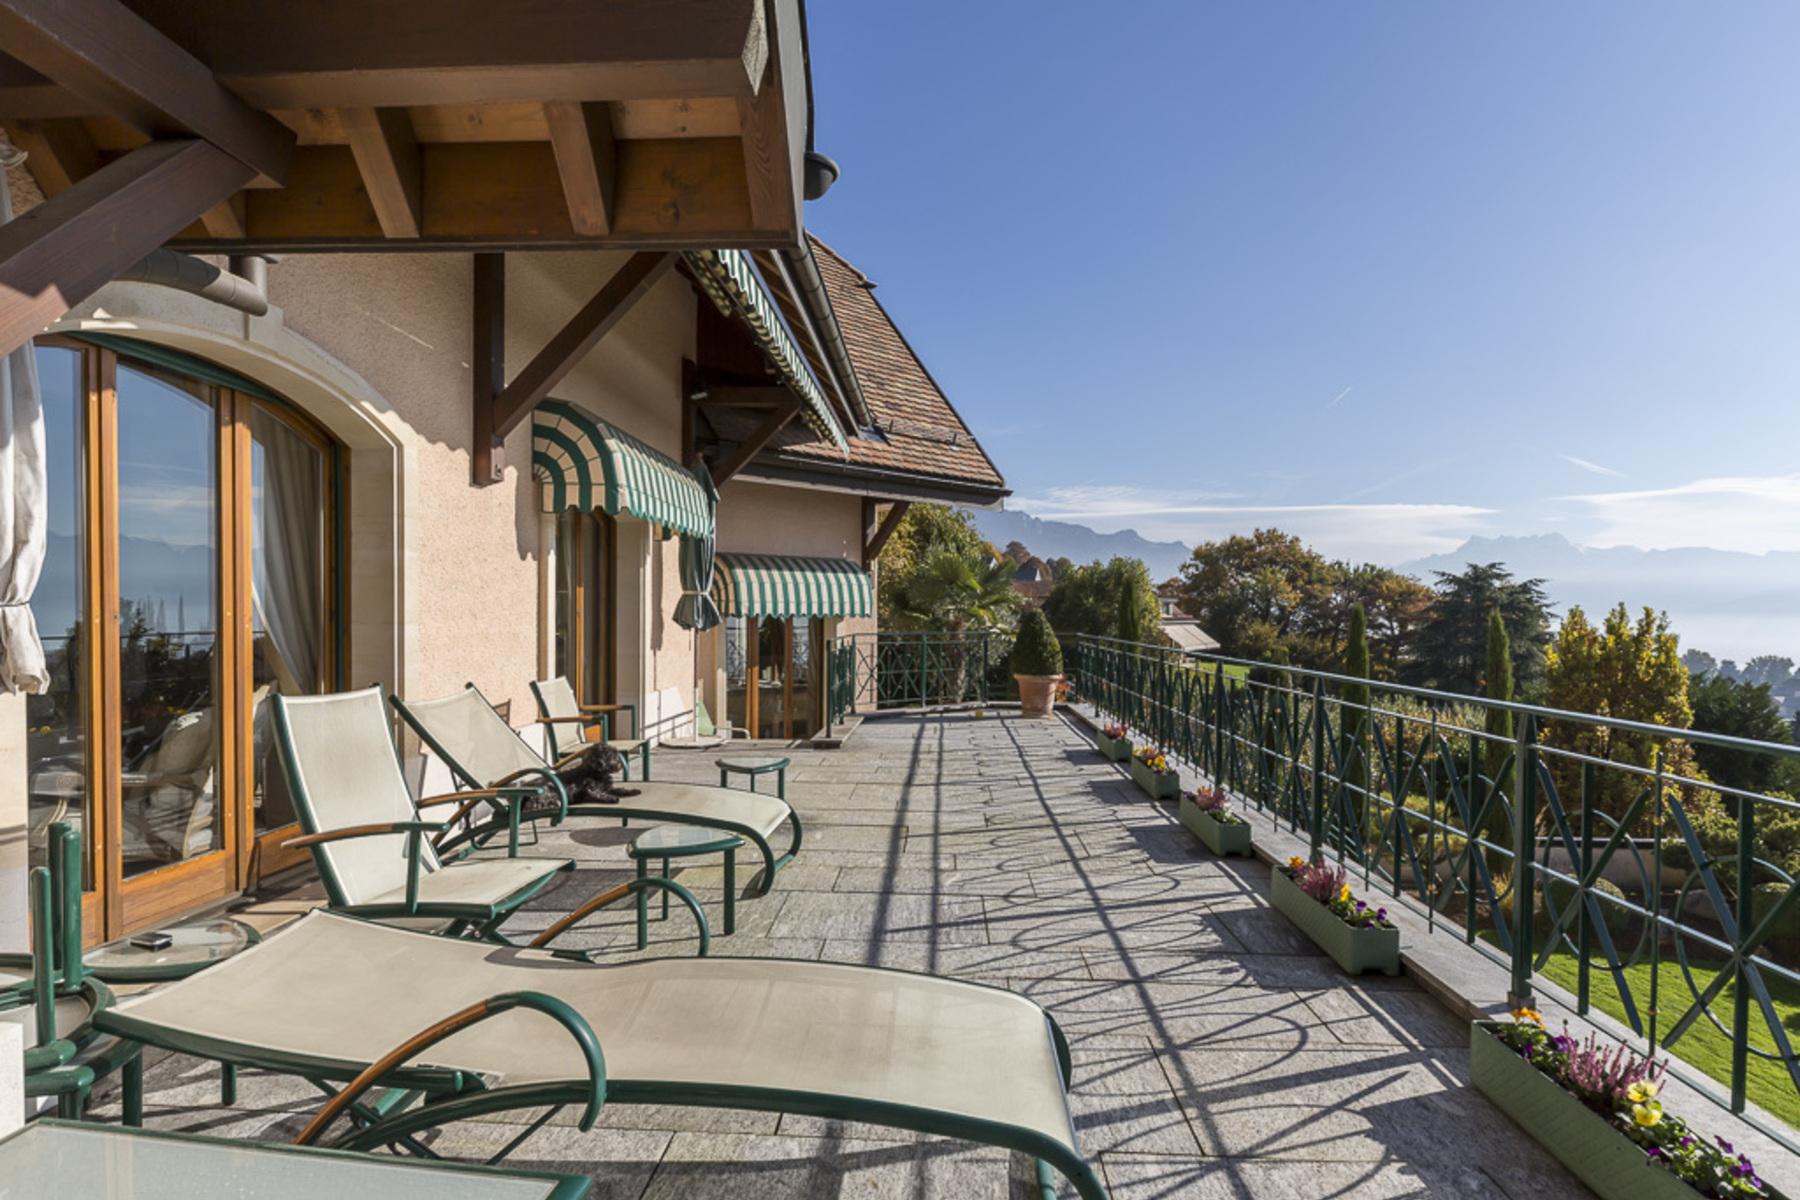 Villa per Vendita alle ore Superb property with spectacular view over the lake Blonay Blonay, Vaud, 1807 Svizzera